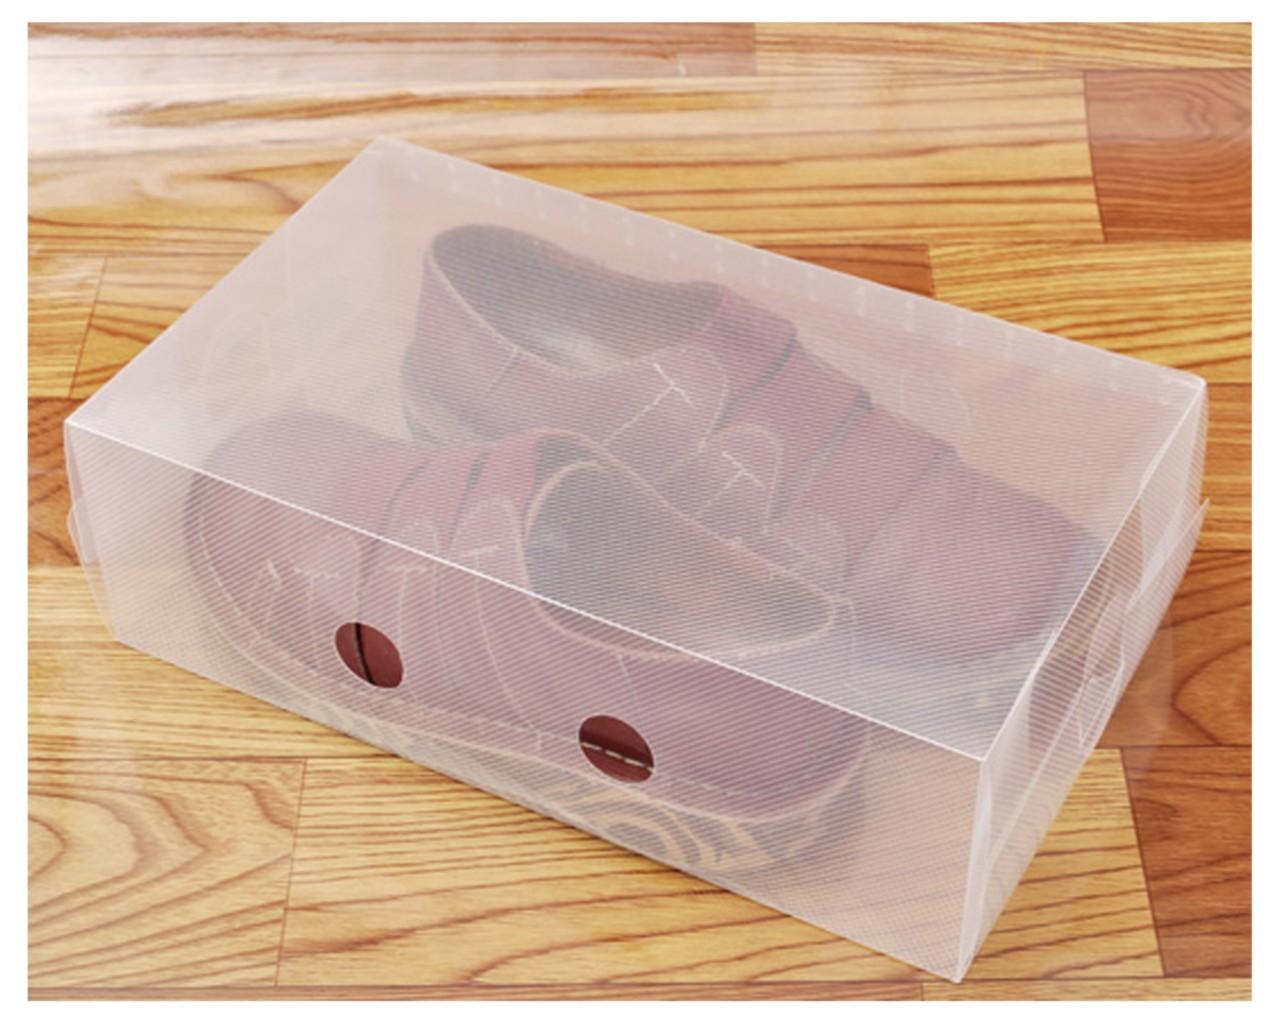 5 10 11 x clear plastic stackable shoe storage boxes organiser shoes unisex ebay. Black Bedroom Furniture Sets. Home Design Ideas